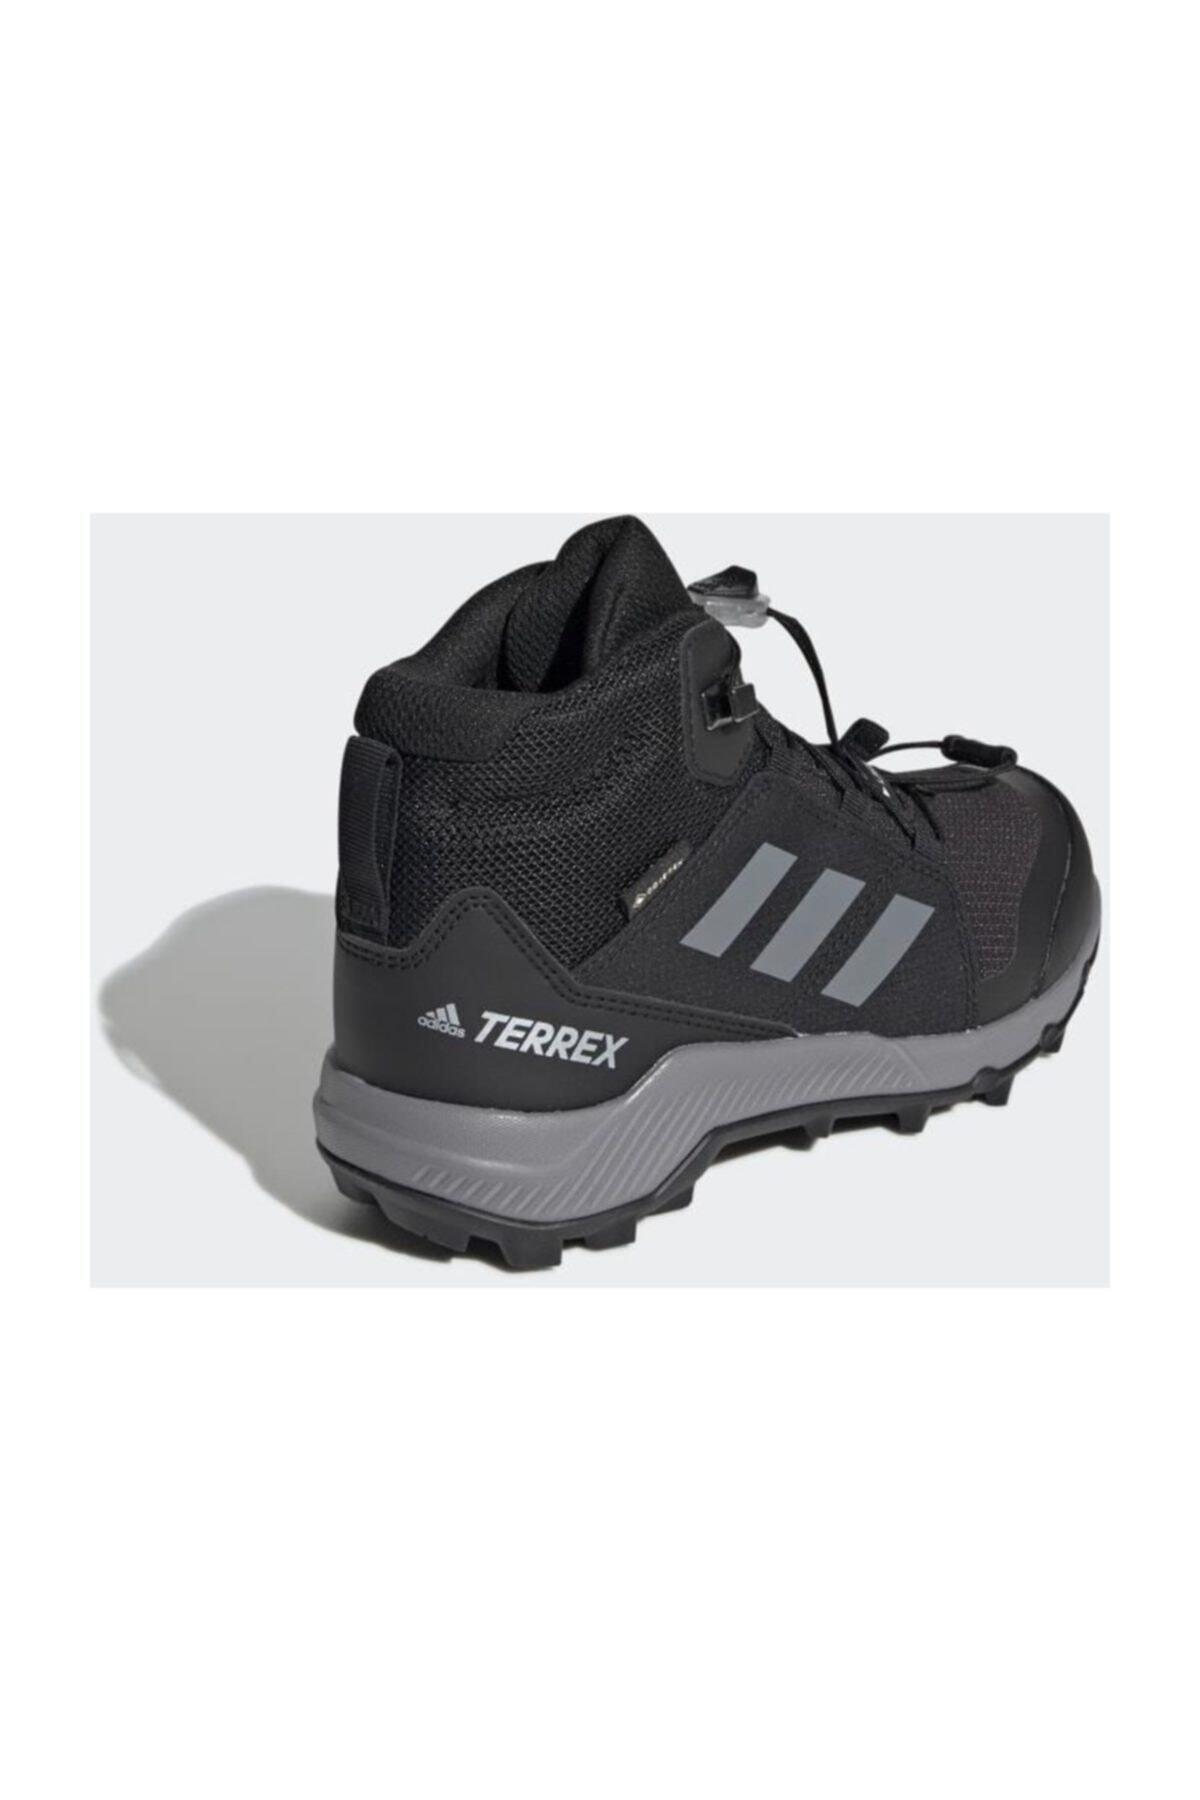 adidas TERREX MID GTX K Siyah Kız Çocuk Outdoor Ayakkabı 100663734 2